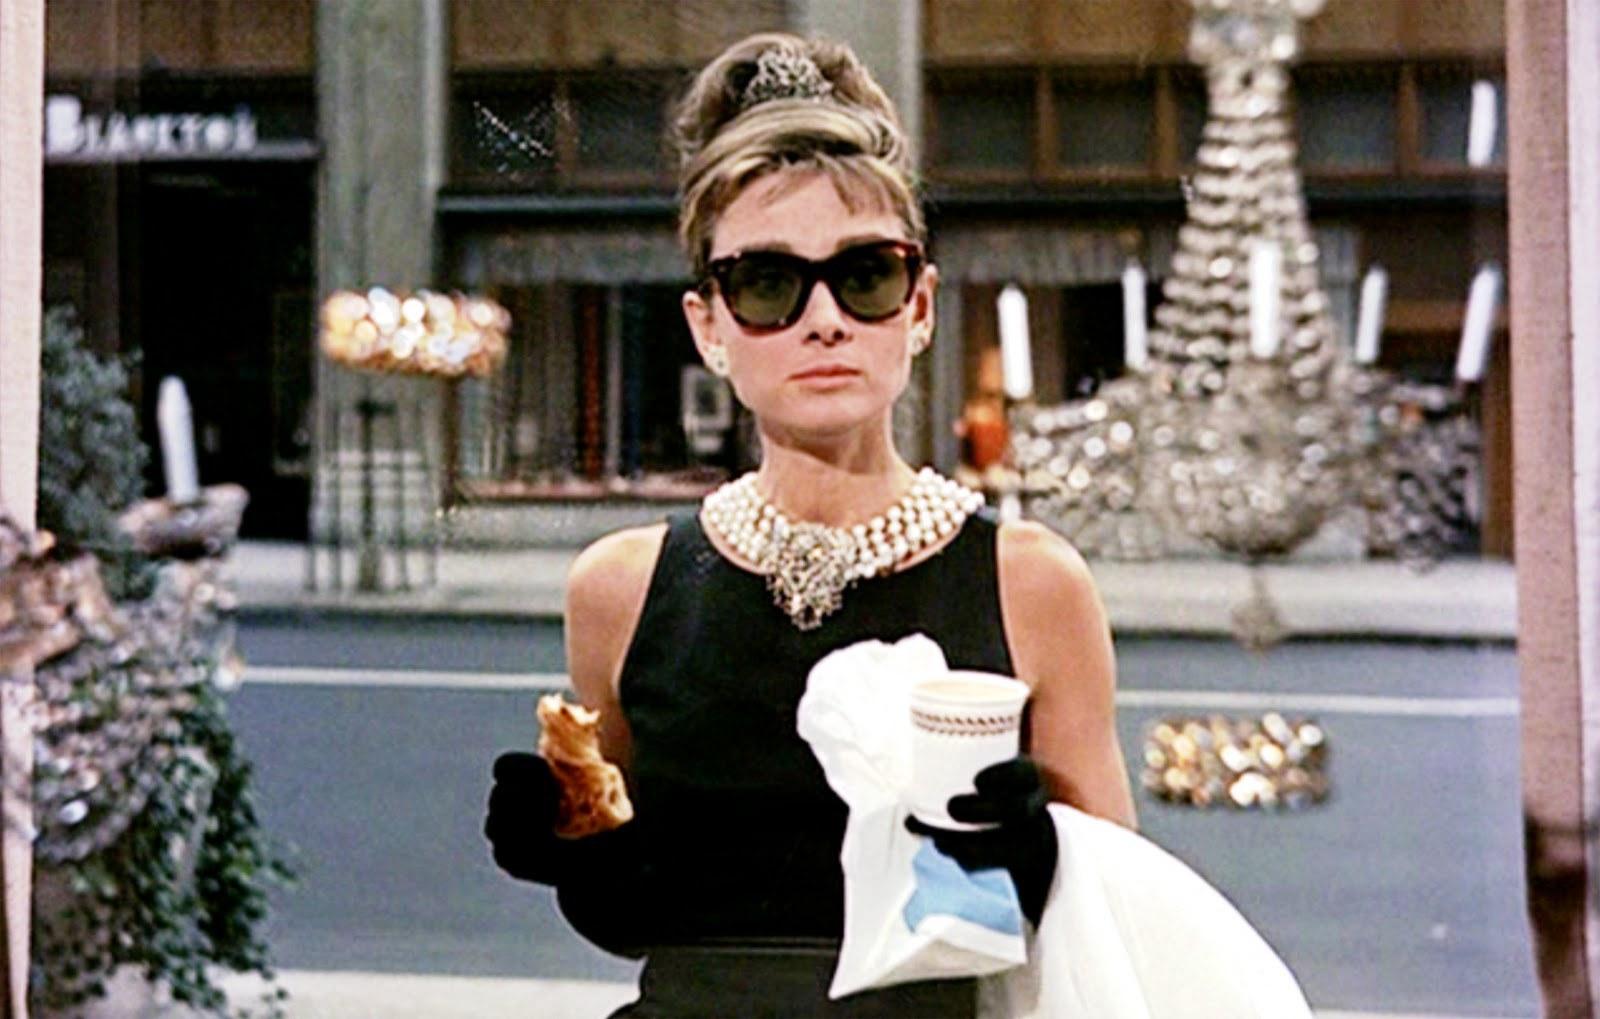 Audrey Hepburn dans Diamants sur canapé (Breakfast at Tiffany's), 1961